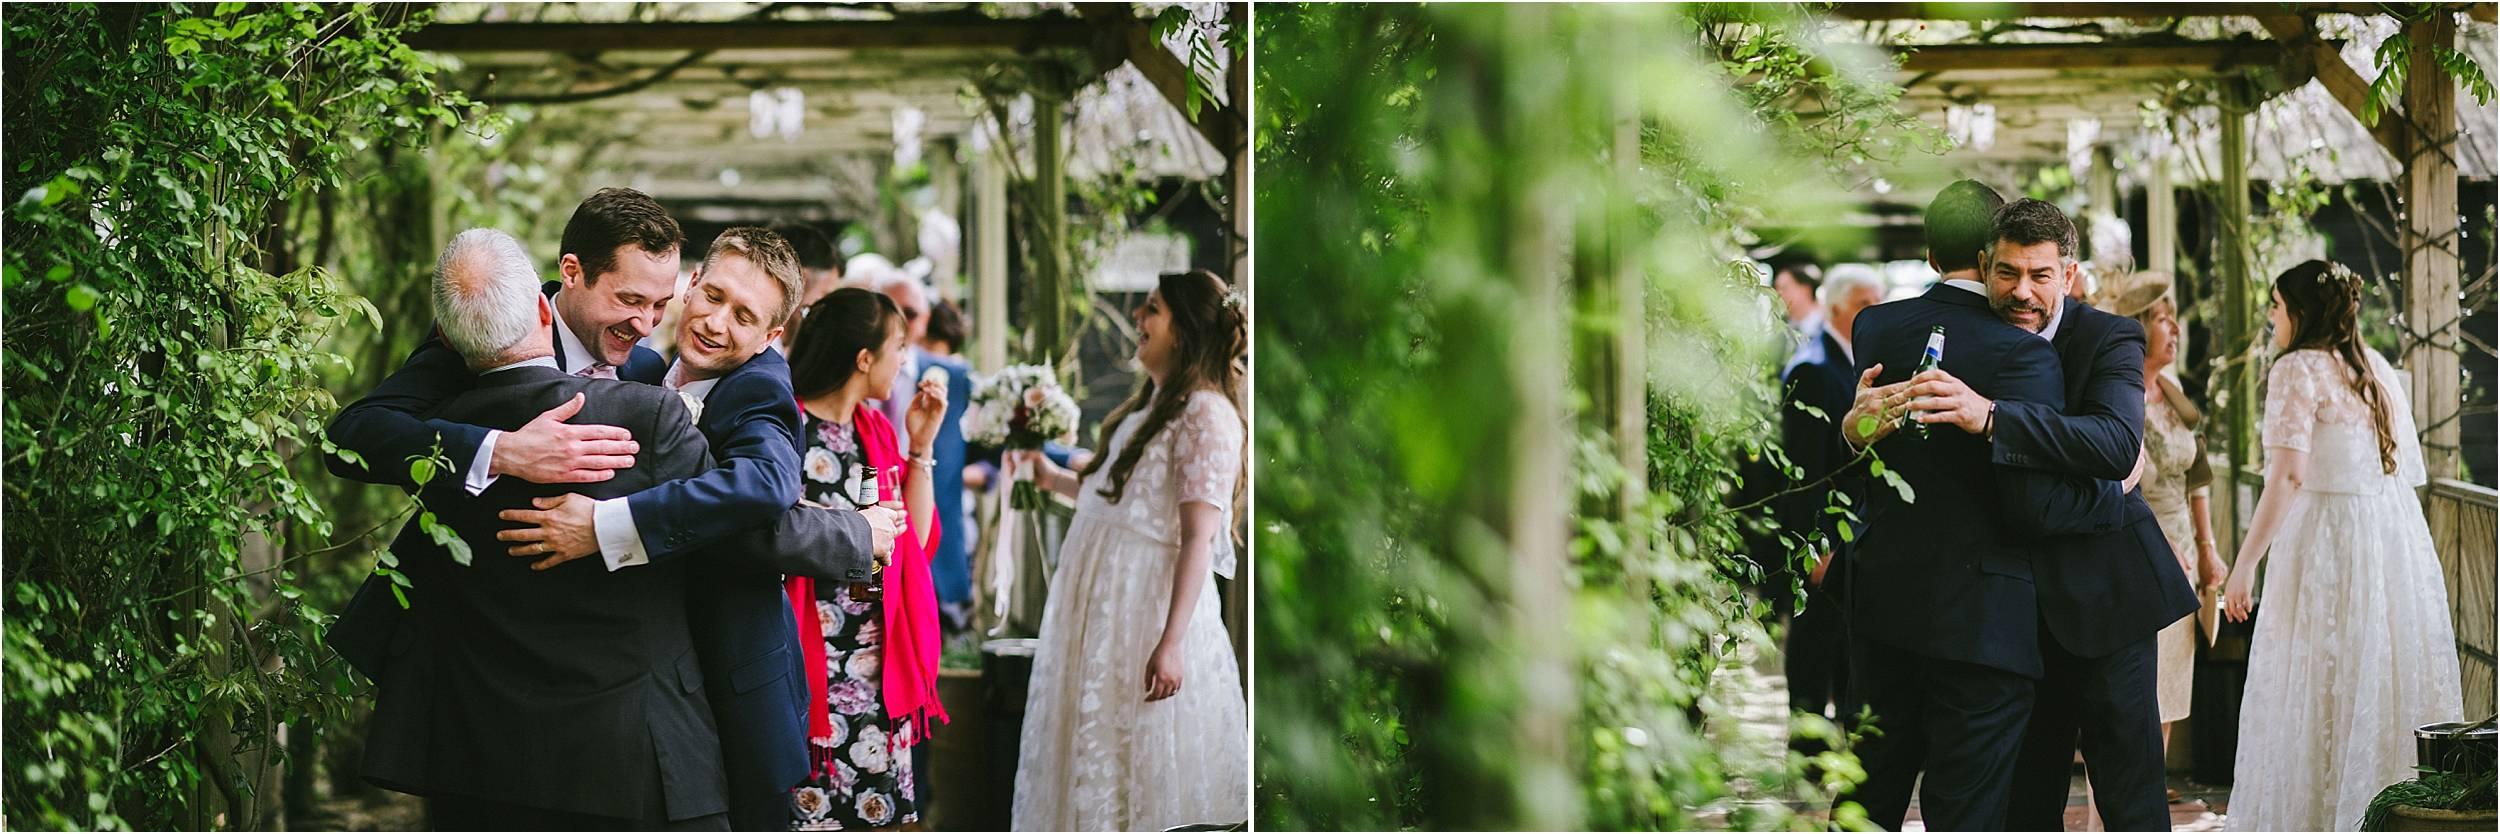 Cambridge Wedding Photographer_0146.jpg